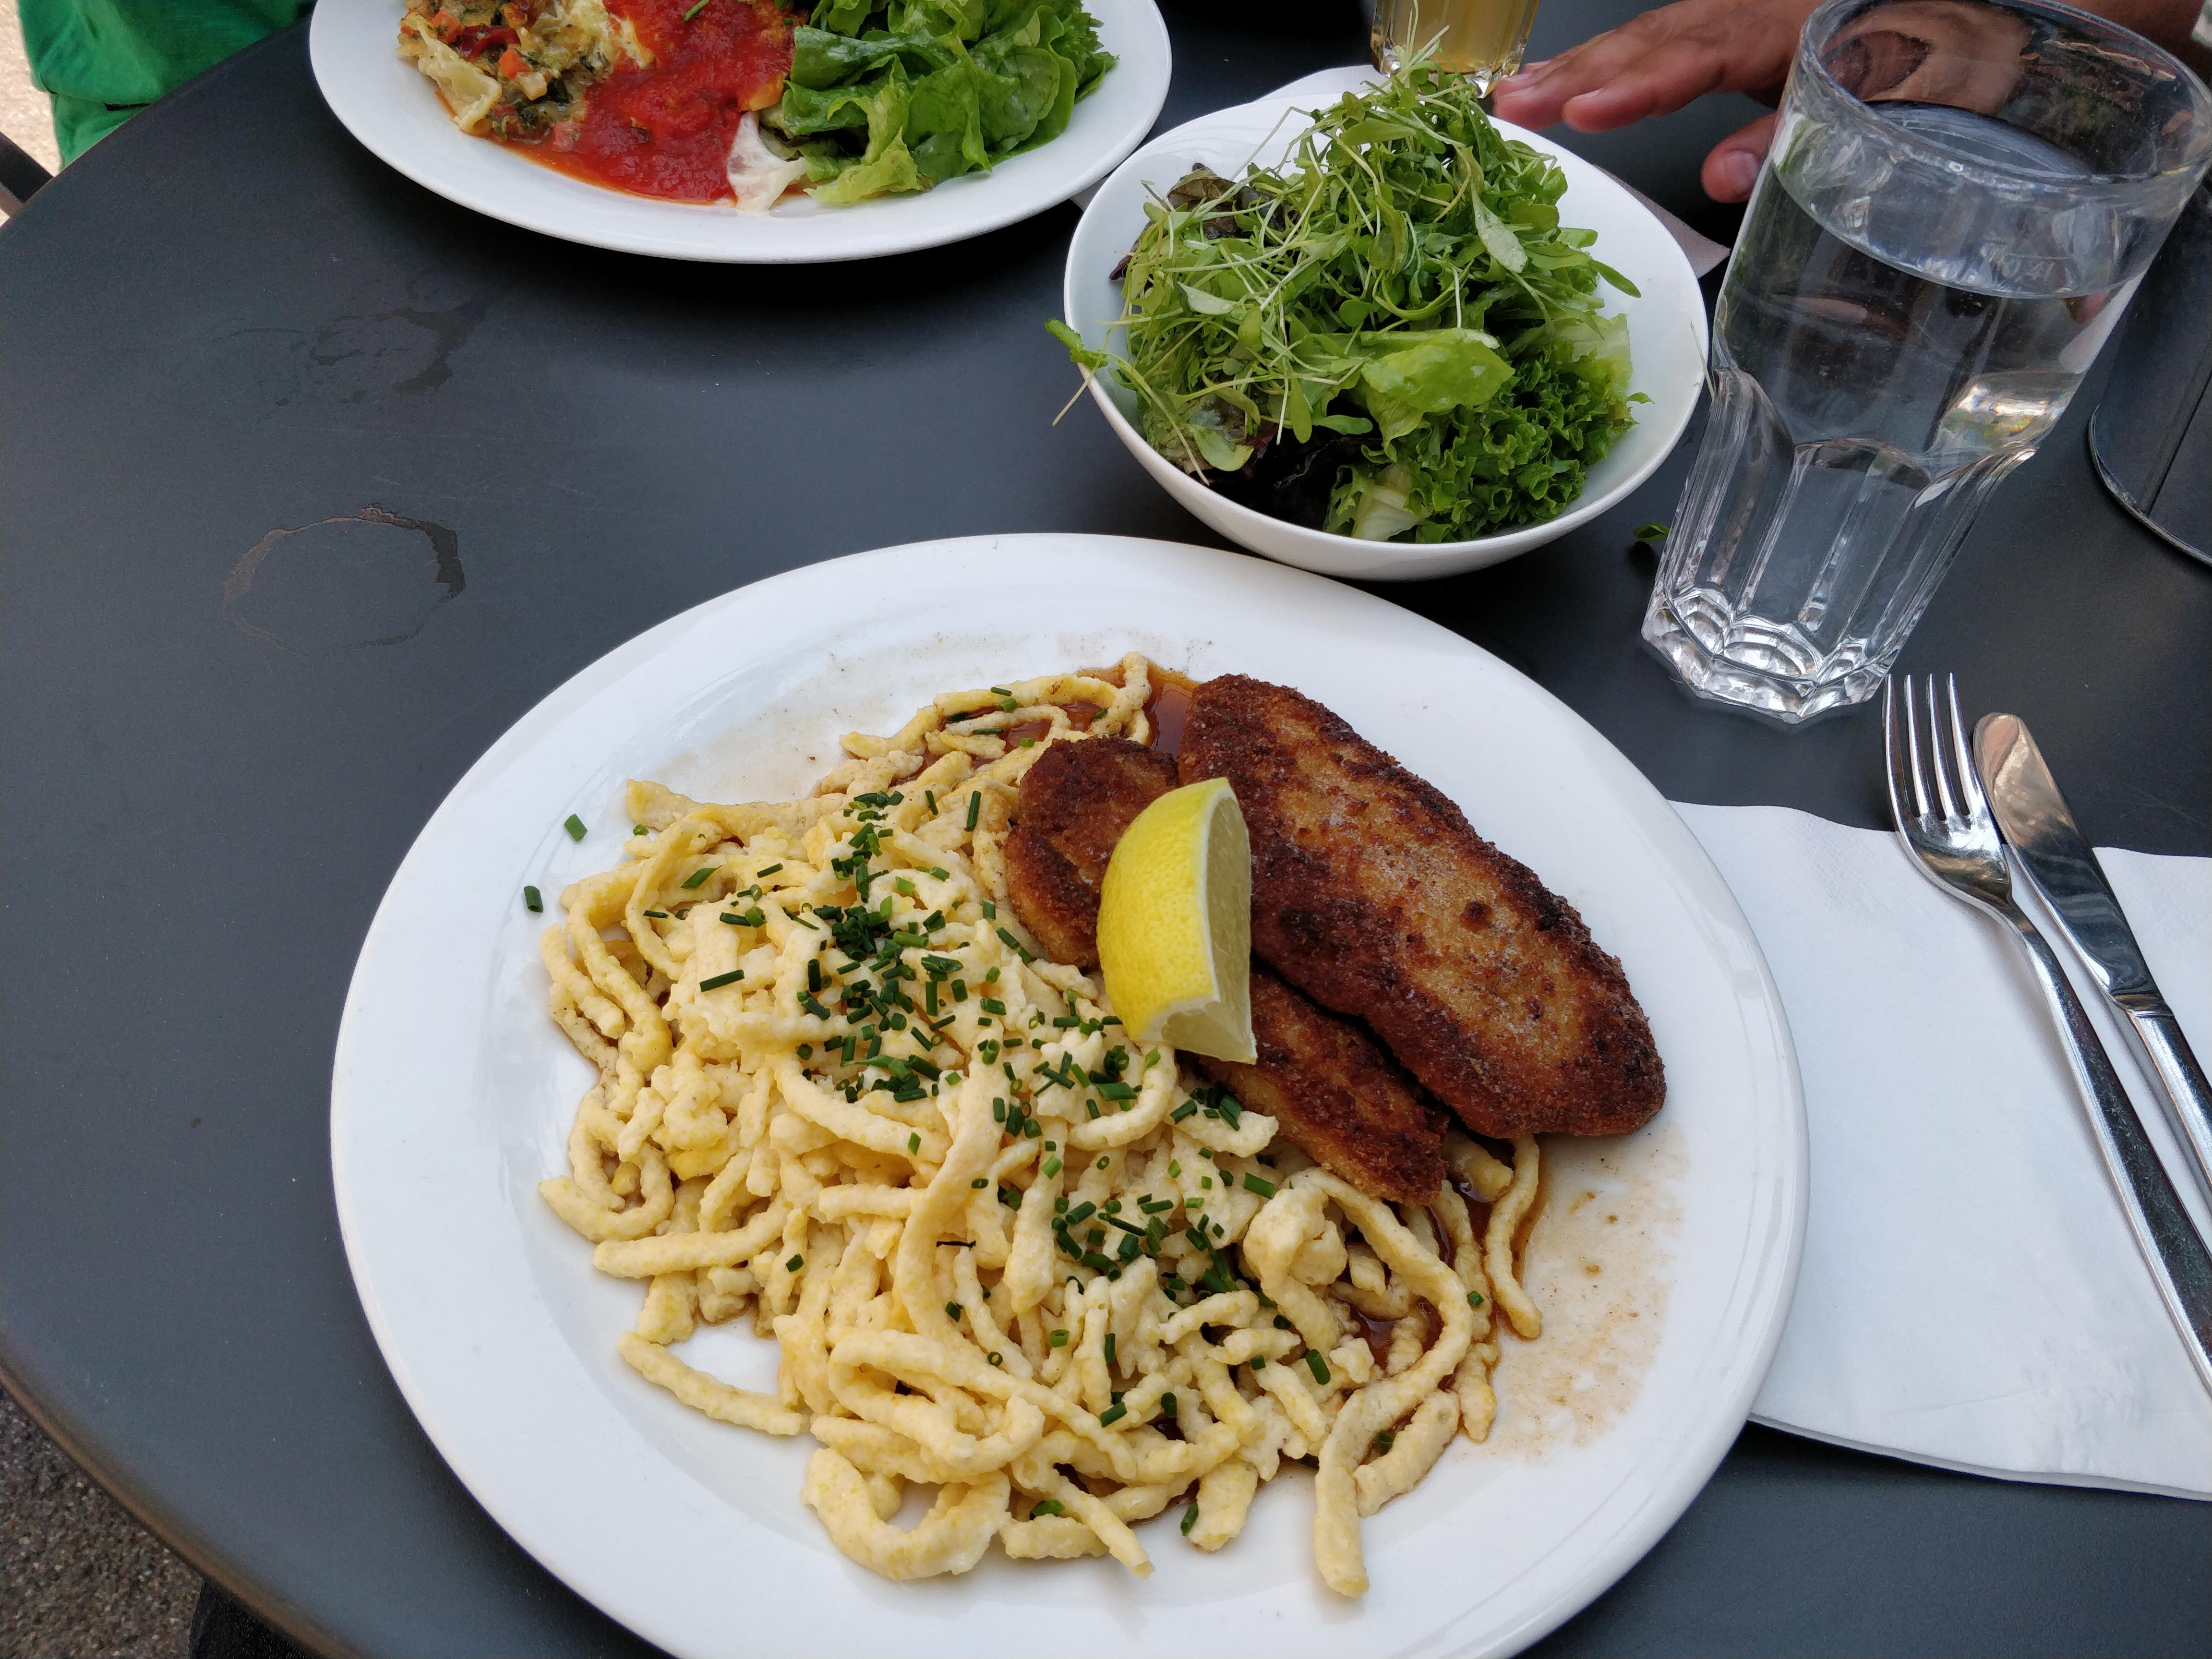 http://foodloader.net/nico_2018-07-24_schnitzel-mit-spaetzle.jpg